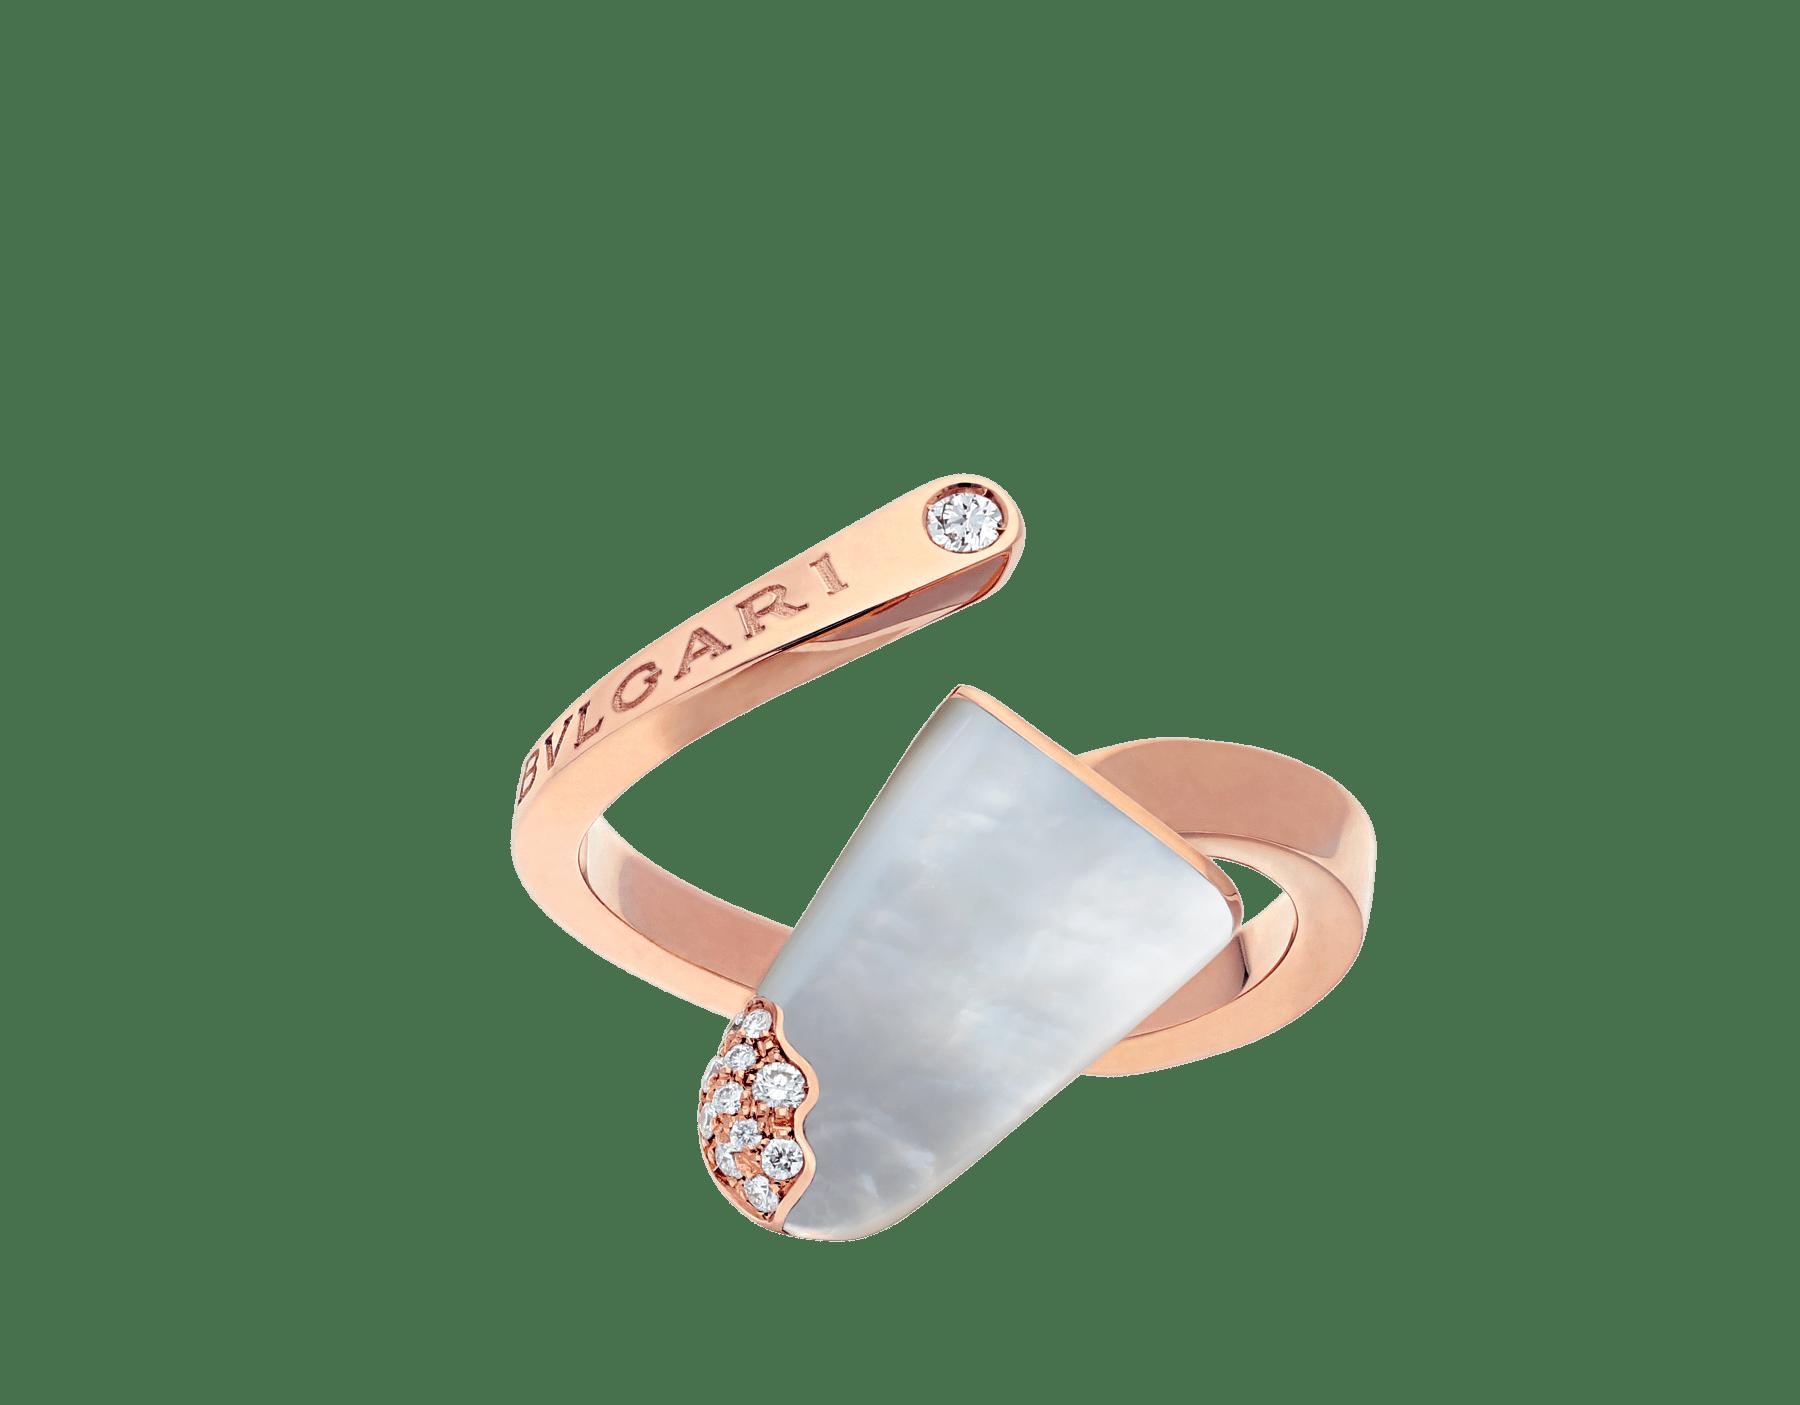 Bague BVLGARI BVLGARI Gelati en or rose 18K avec nacre et pavé diamants AN858014 image 1